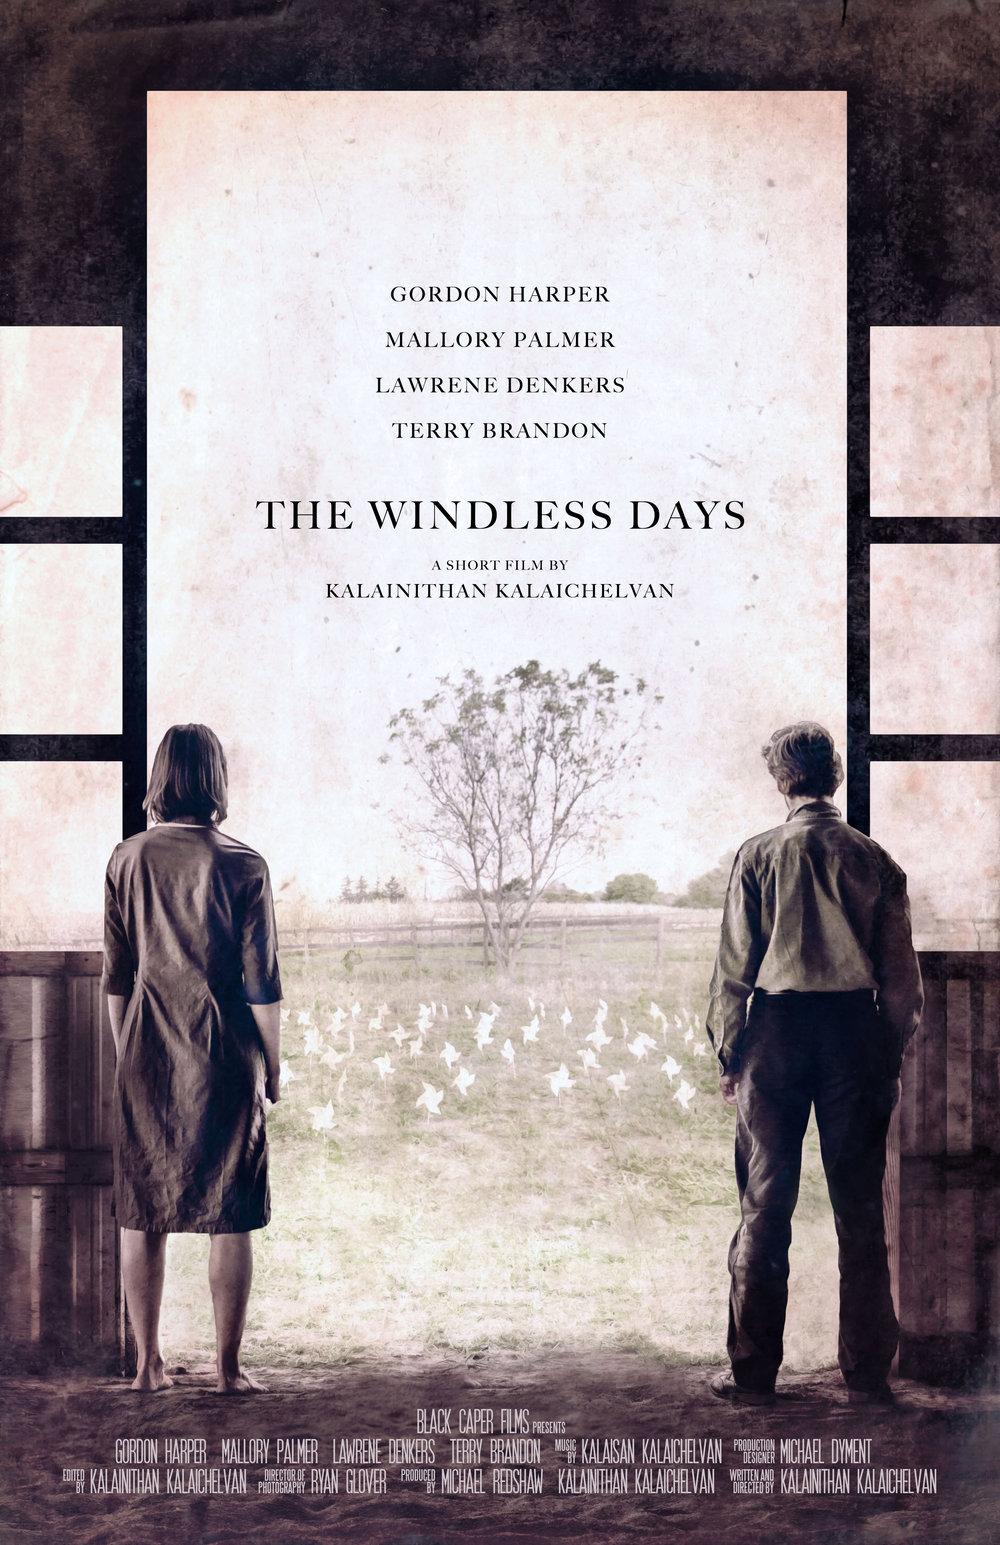 The Windless Days P O S T E R.jpg